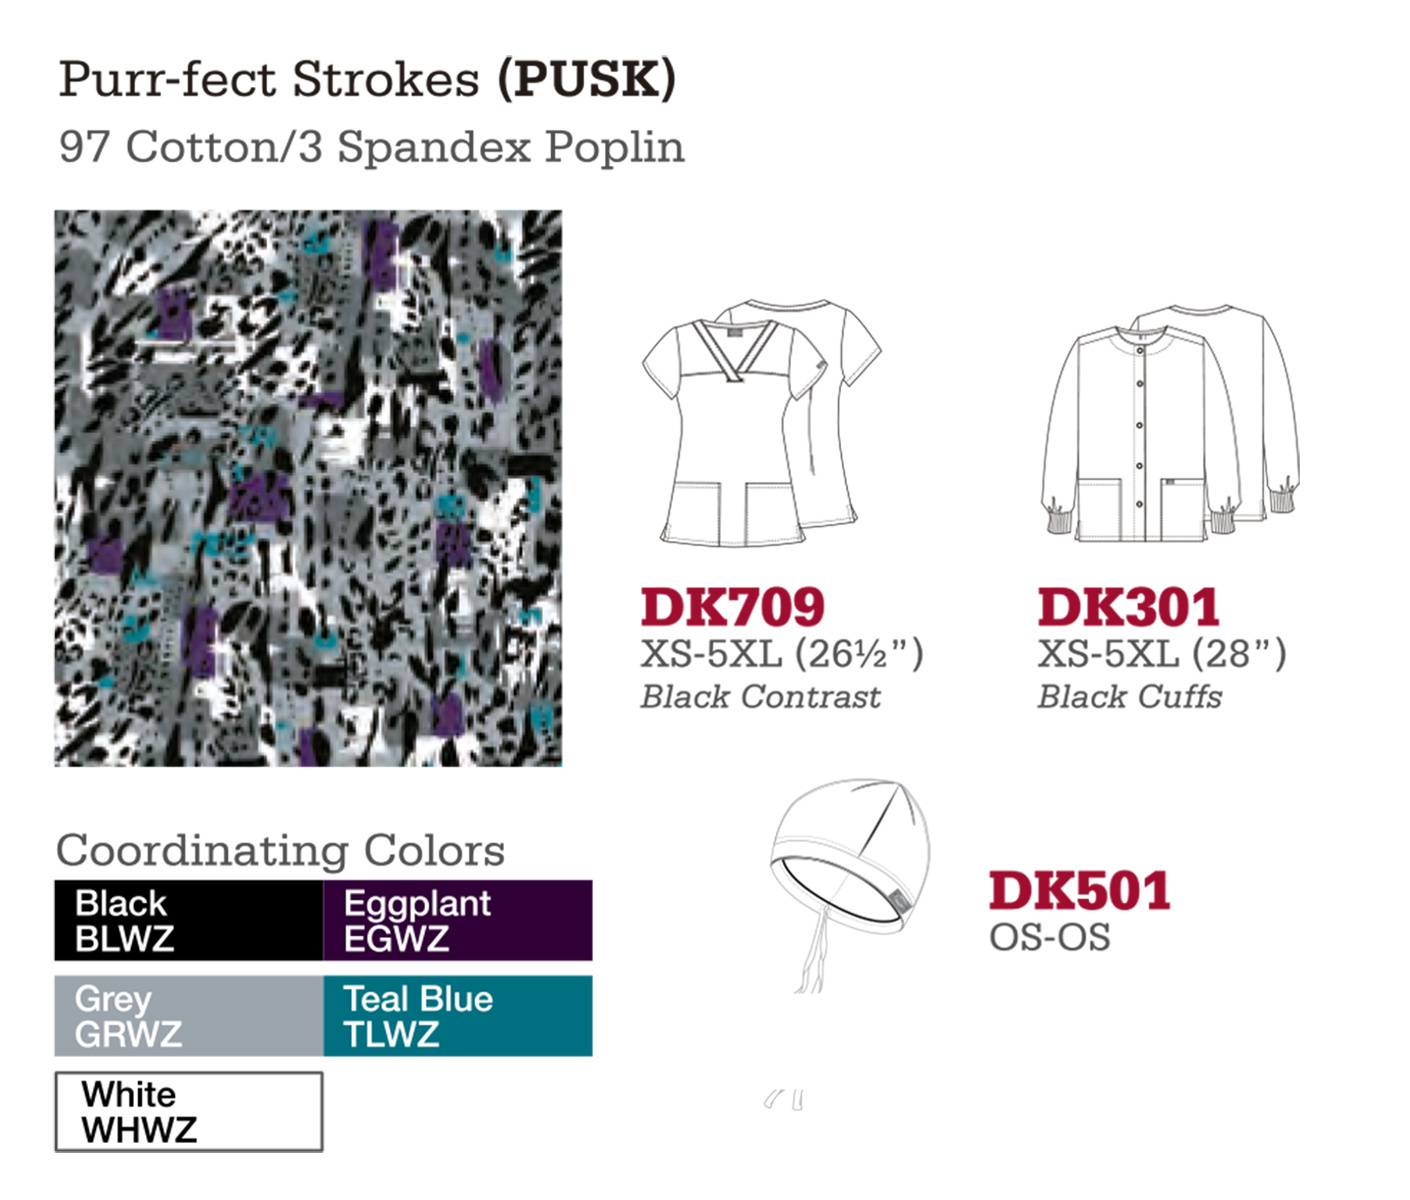 Purr-fect Strokes. DK709. DK301. DK501.